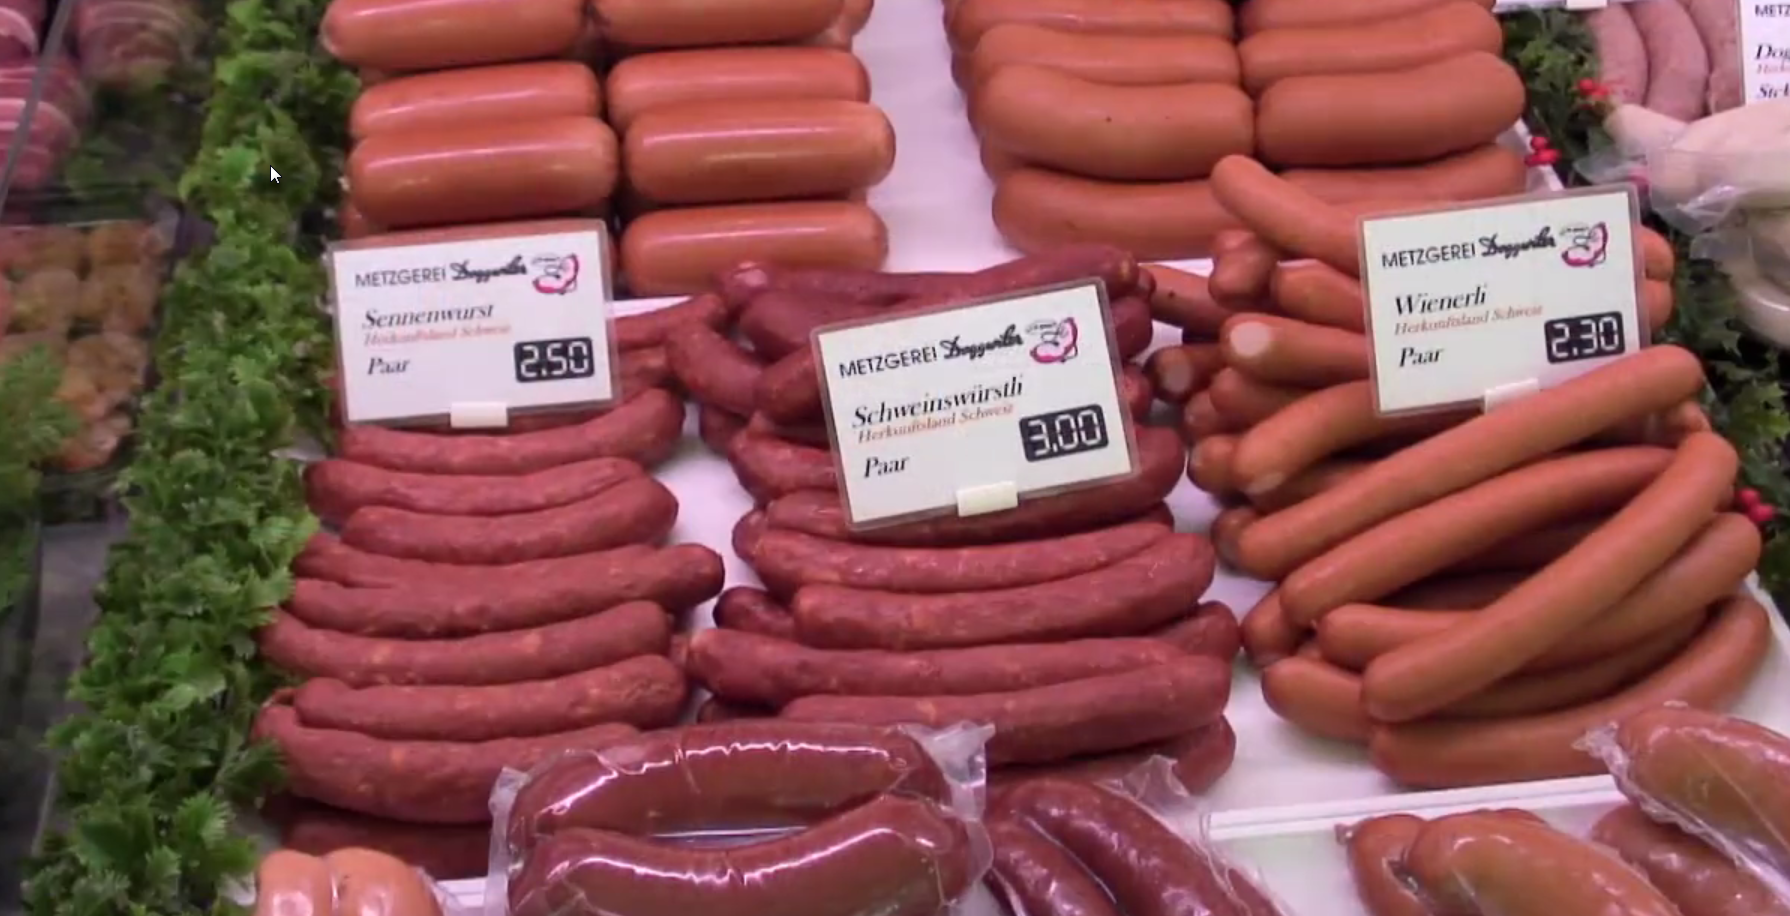 Metzgerei Doggwiler GmbH